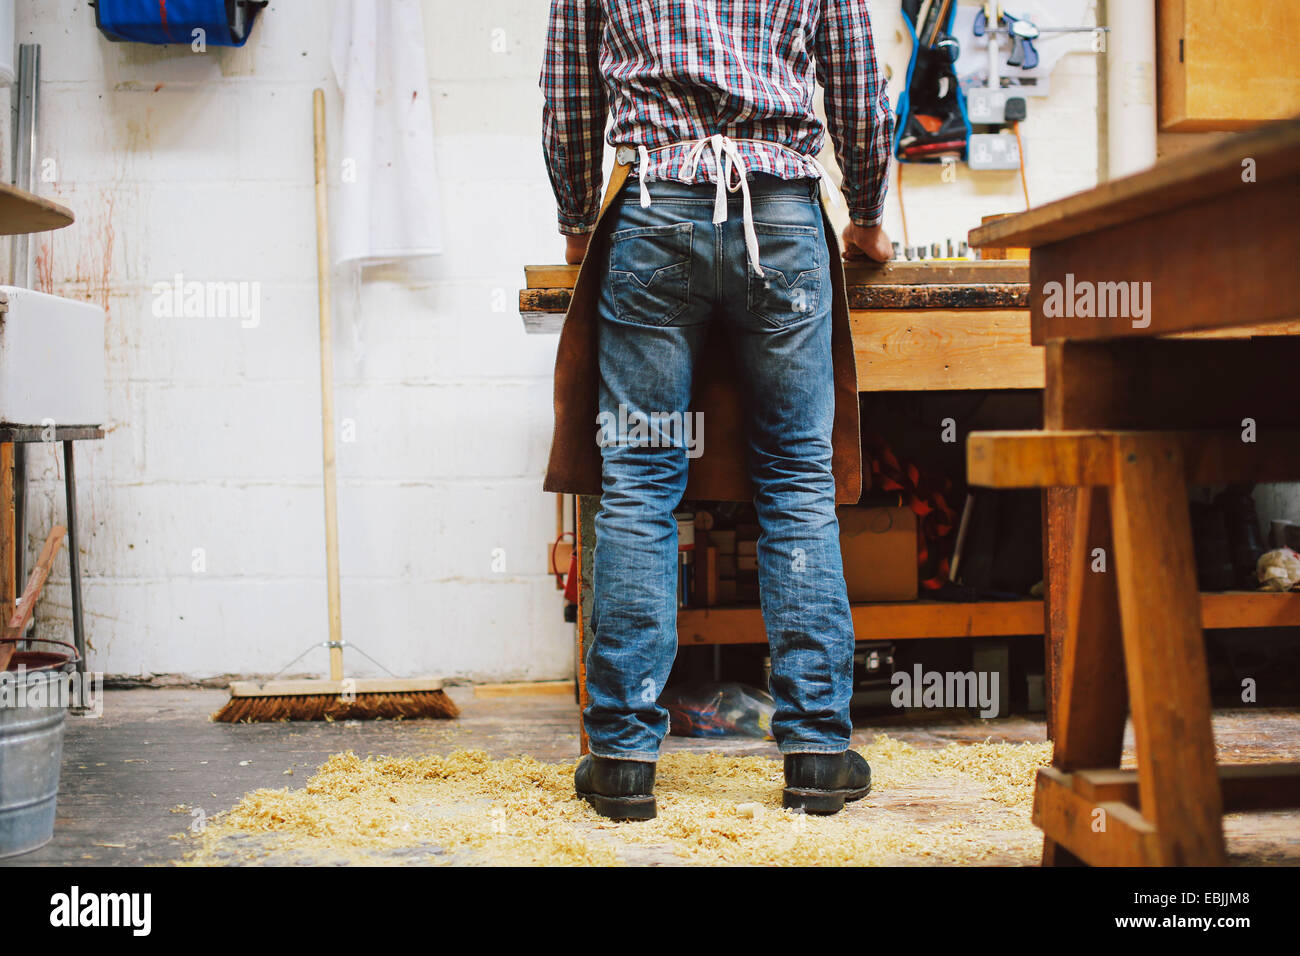 Blick auf ältere Handwerker an Werkbank in Rohr Orgelwerkstatt beschnitten Stockbild